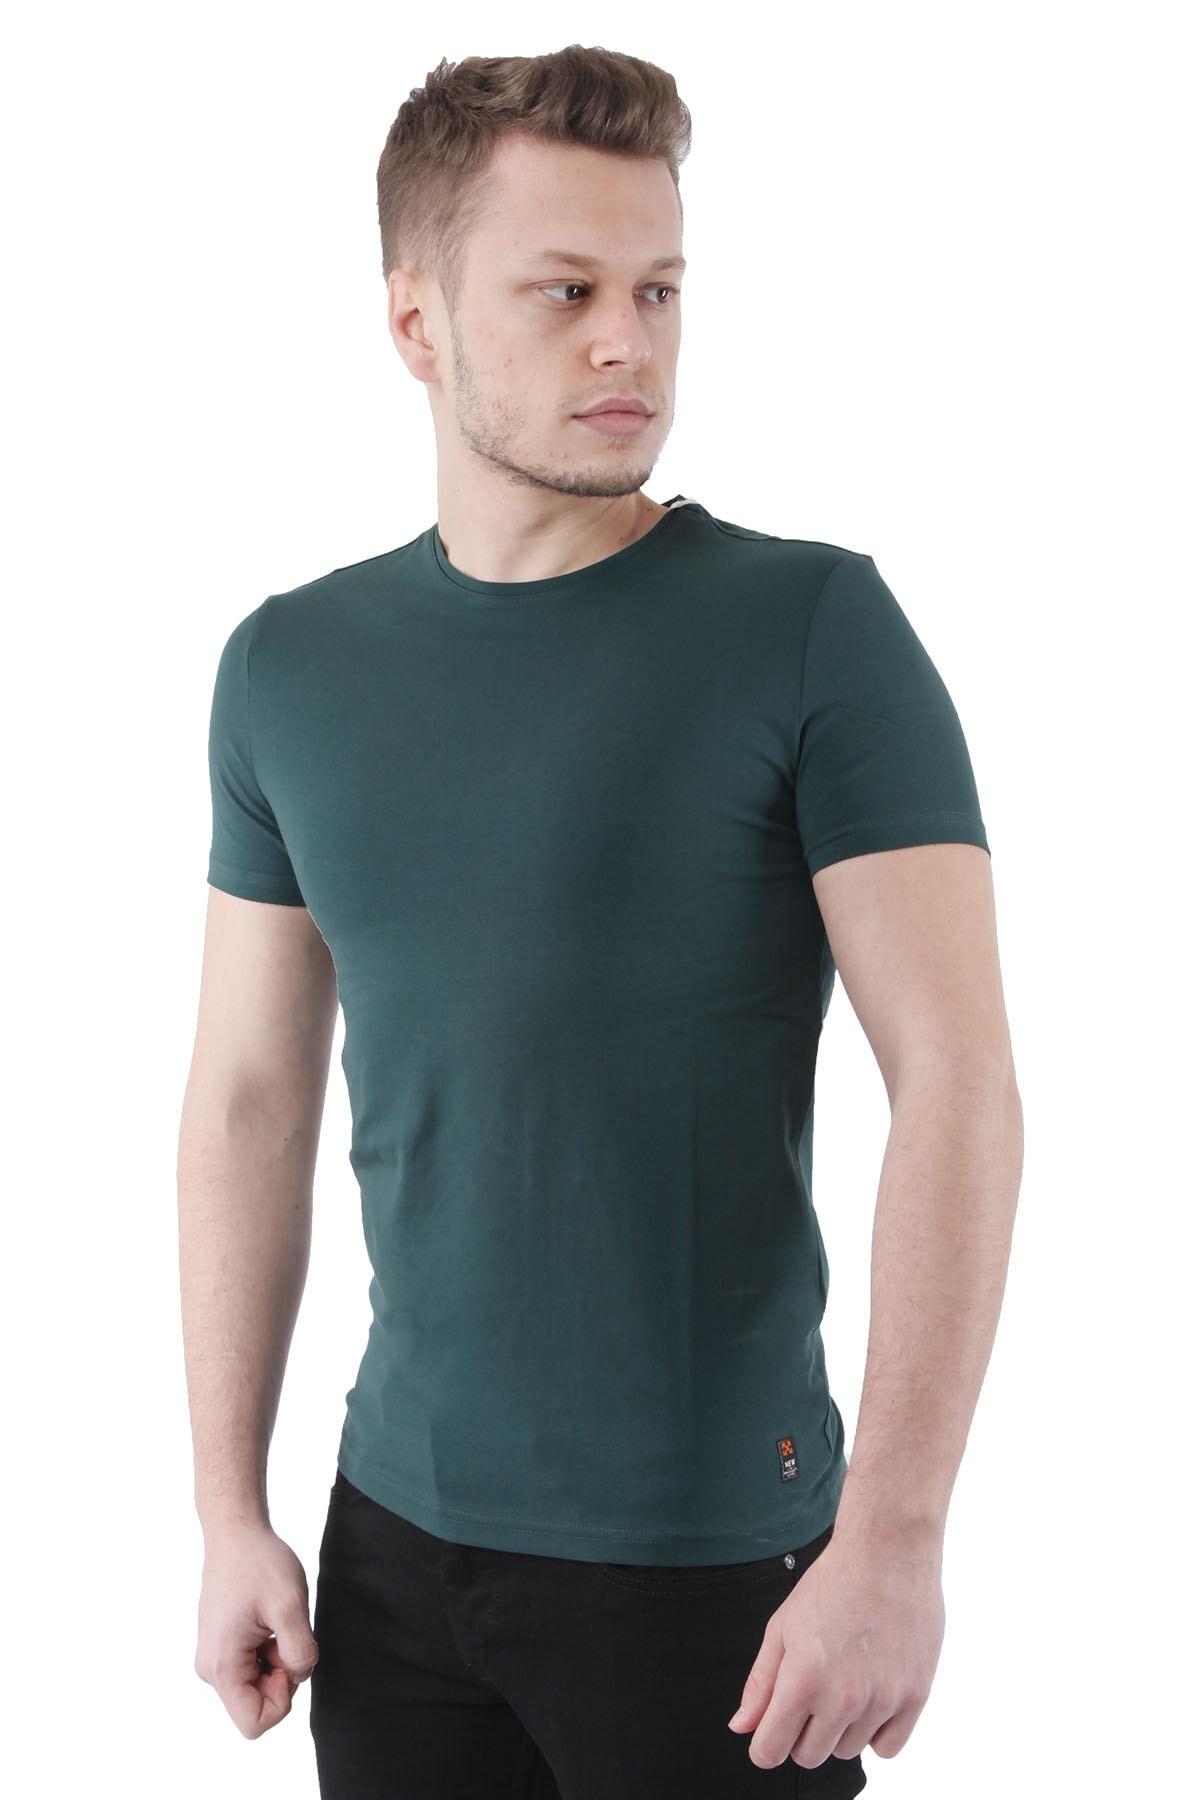 Canelia Koyu Yeşil Erkek Slimfit T-shirt 2